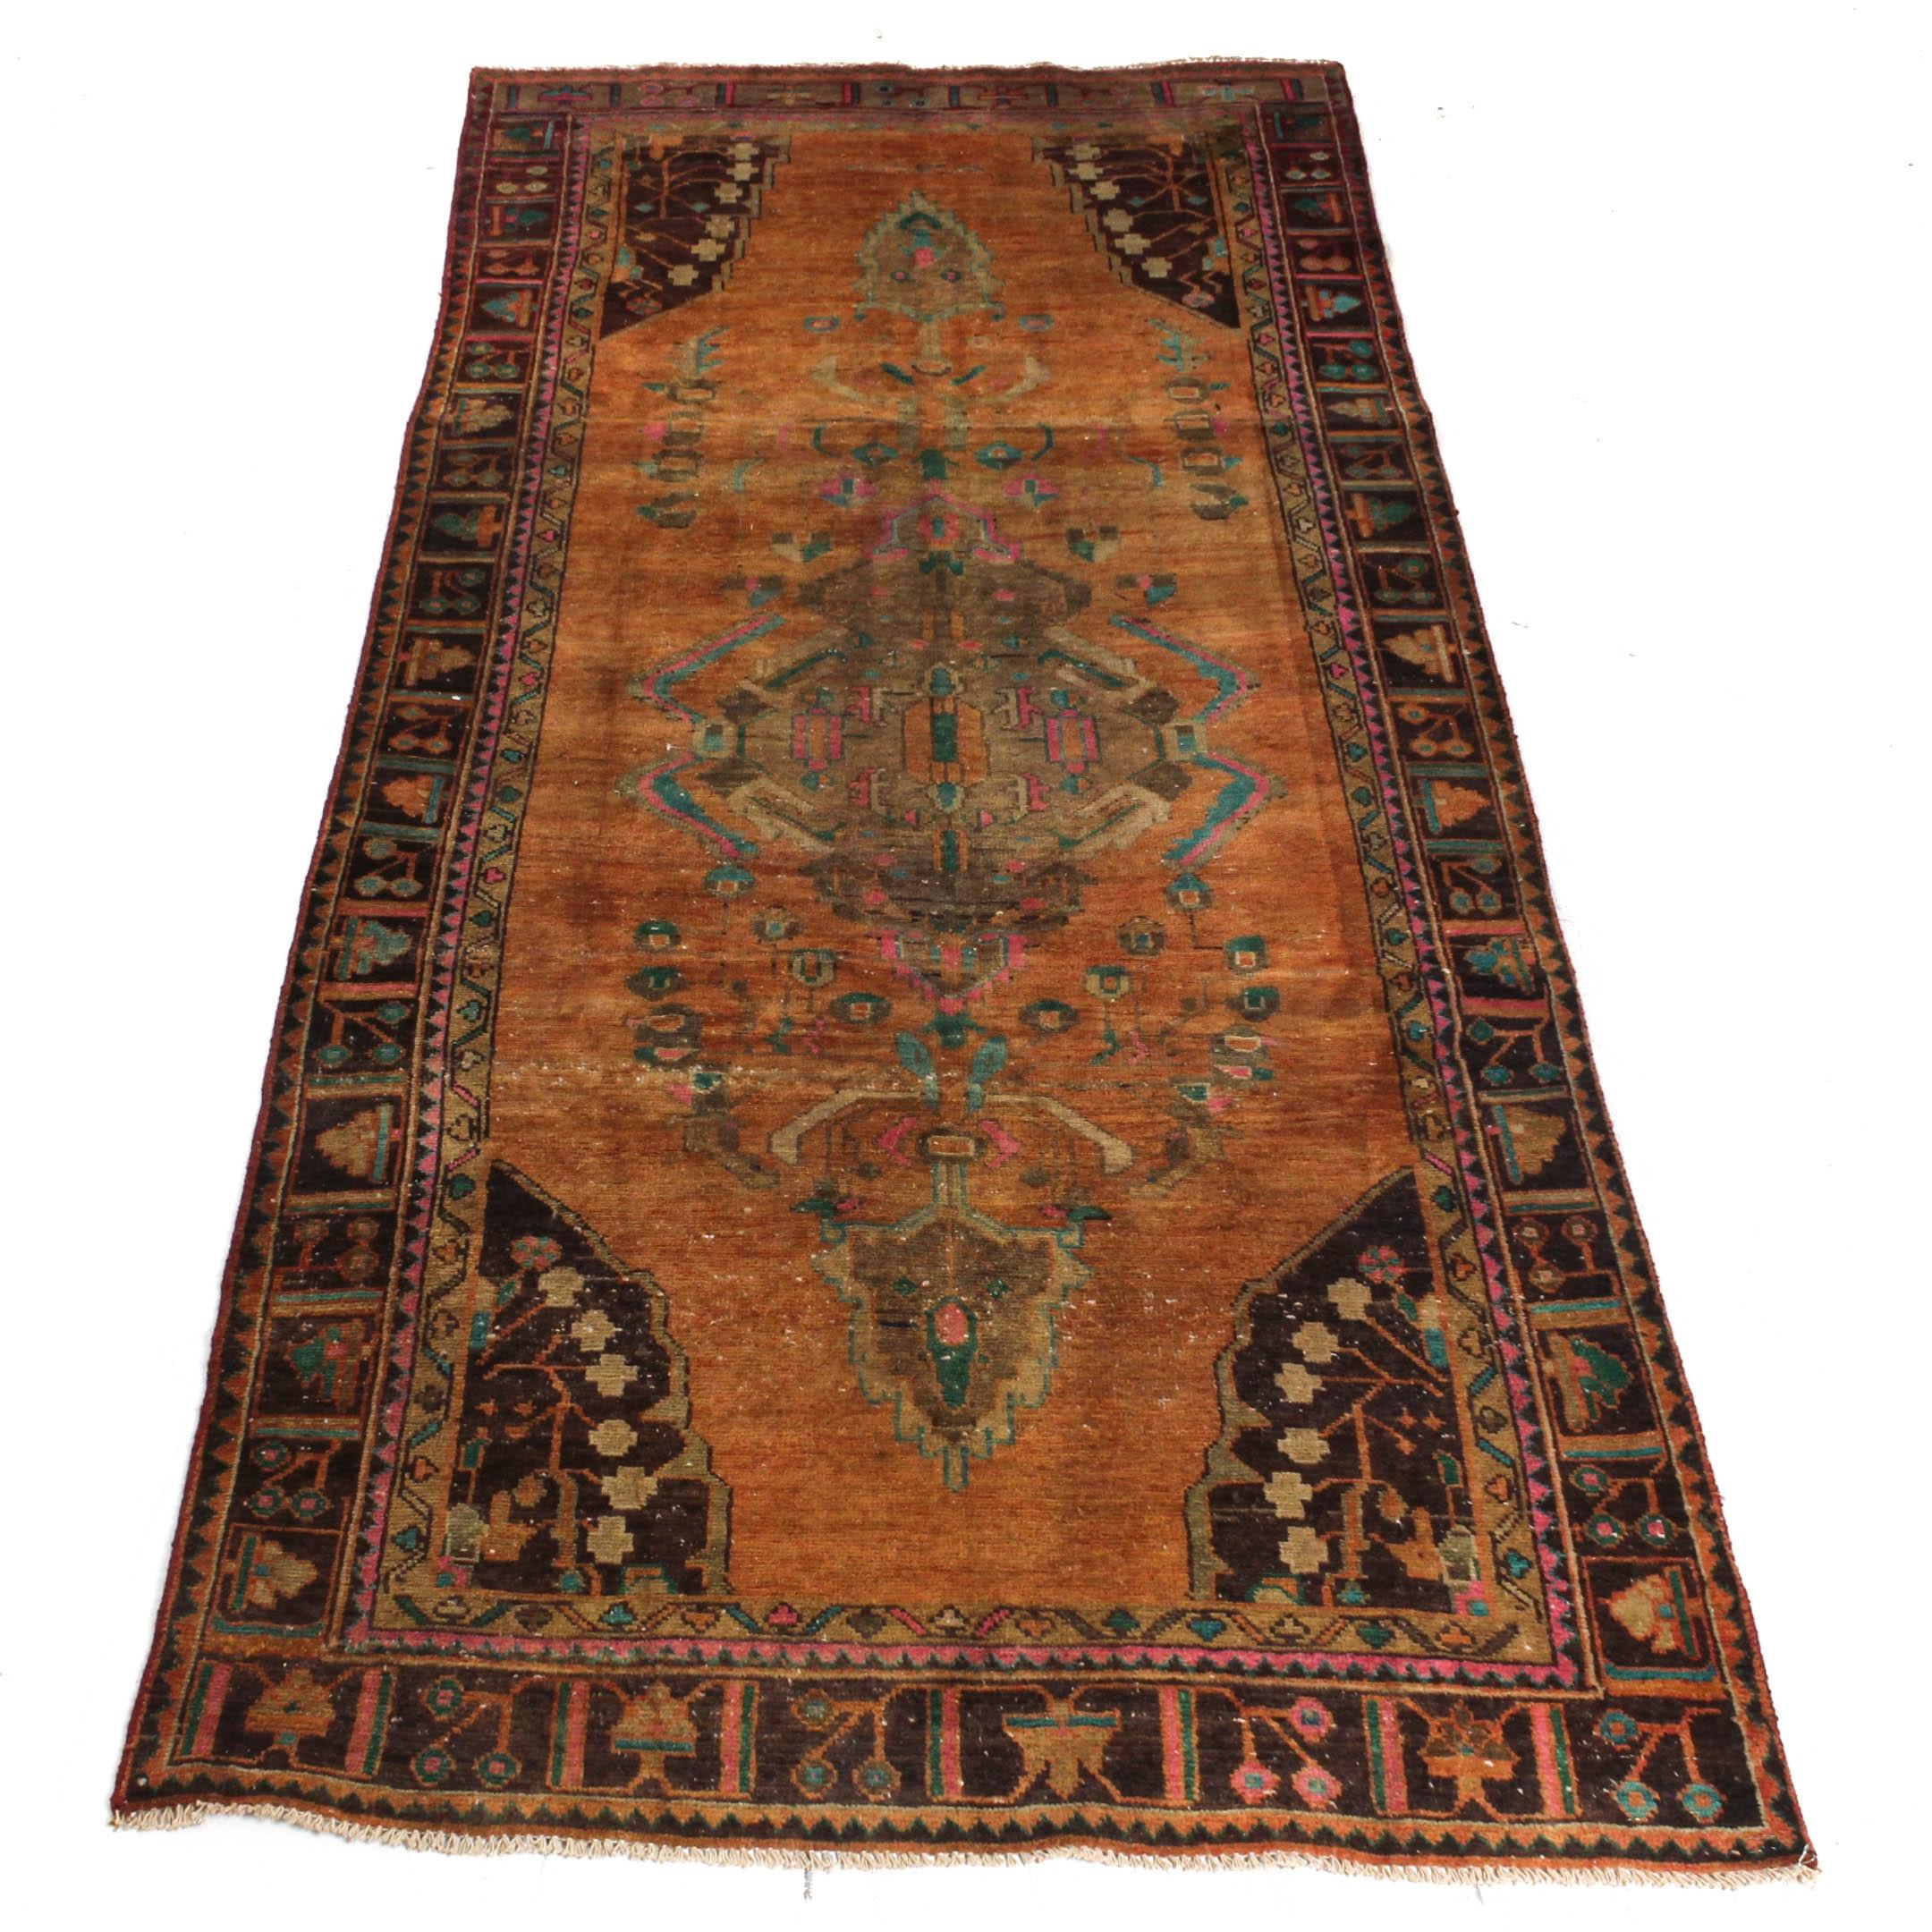 Semi-Antique Hand-Knotted Persian Mahal Sarouk Rug